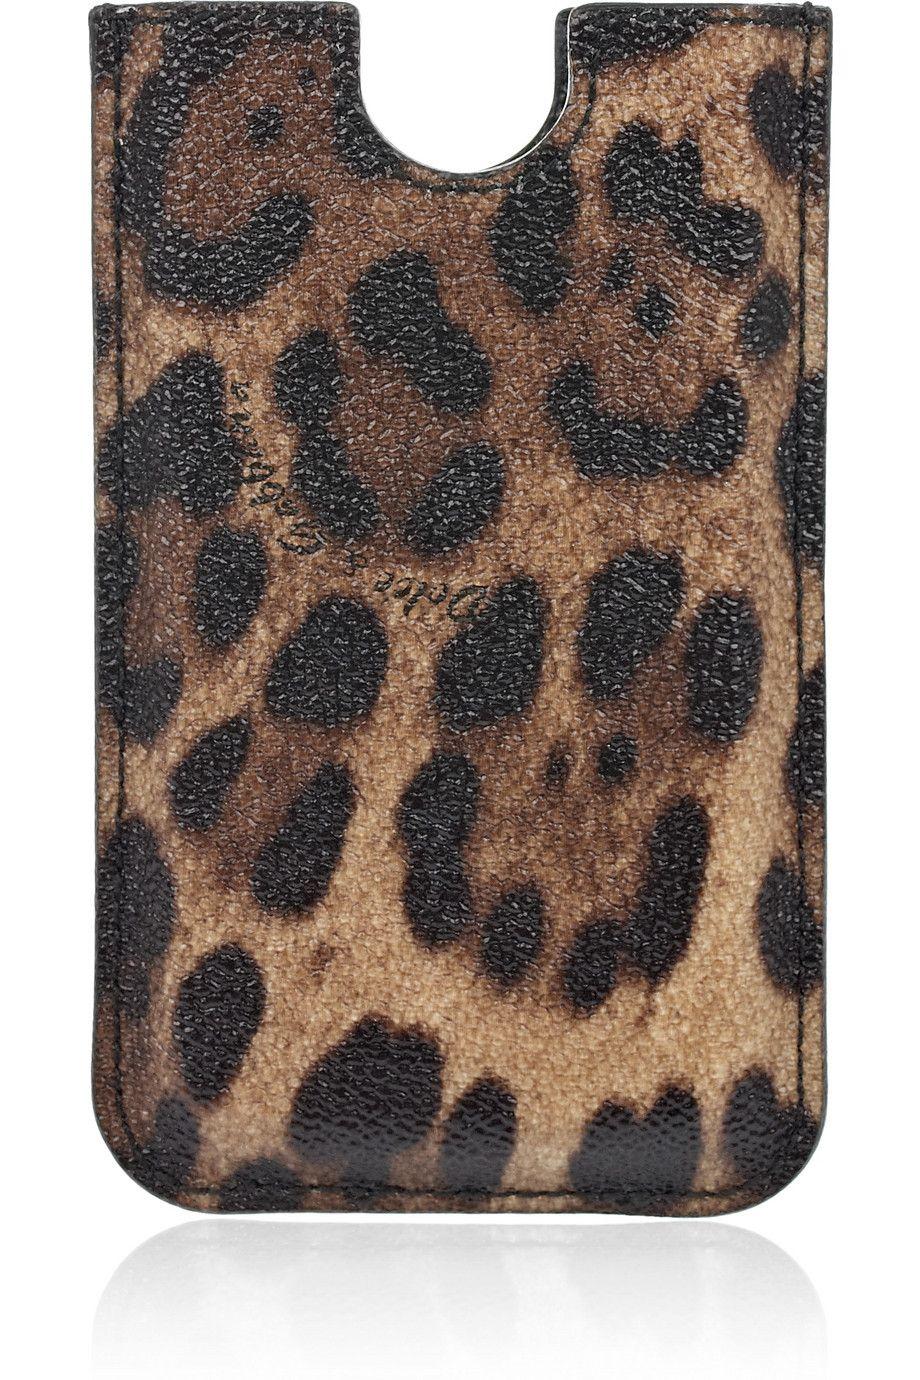 Dolce & Gabbana Leopard-print faux leather iPhone 4 case NET-A-PORTER.COM